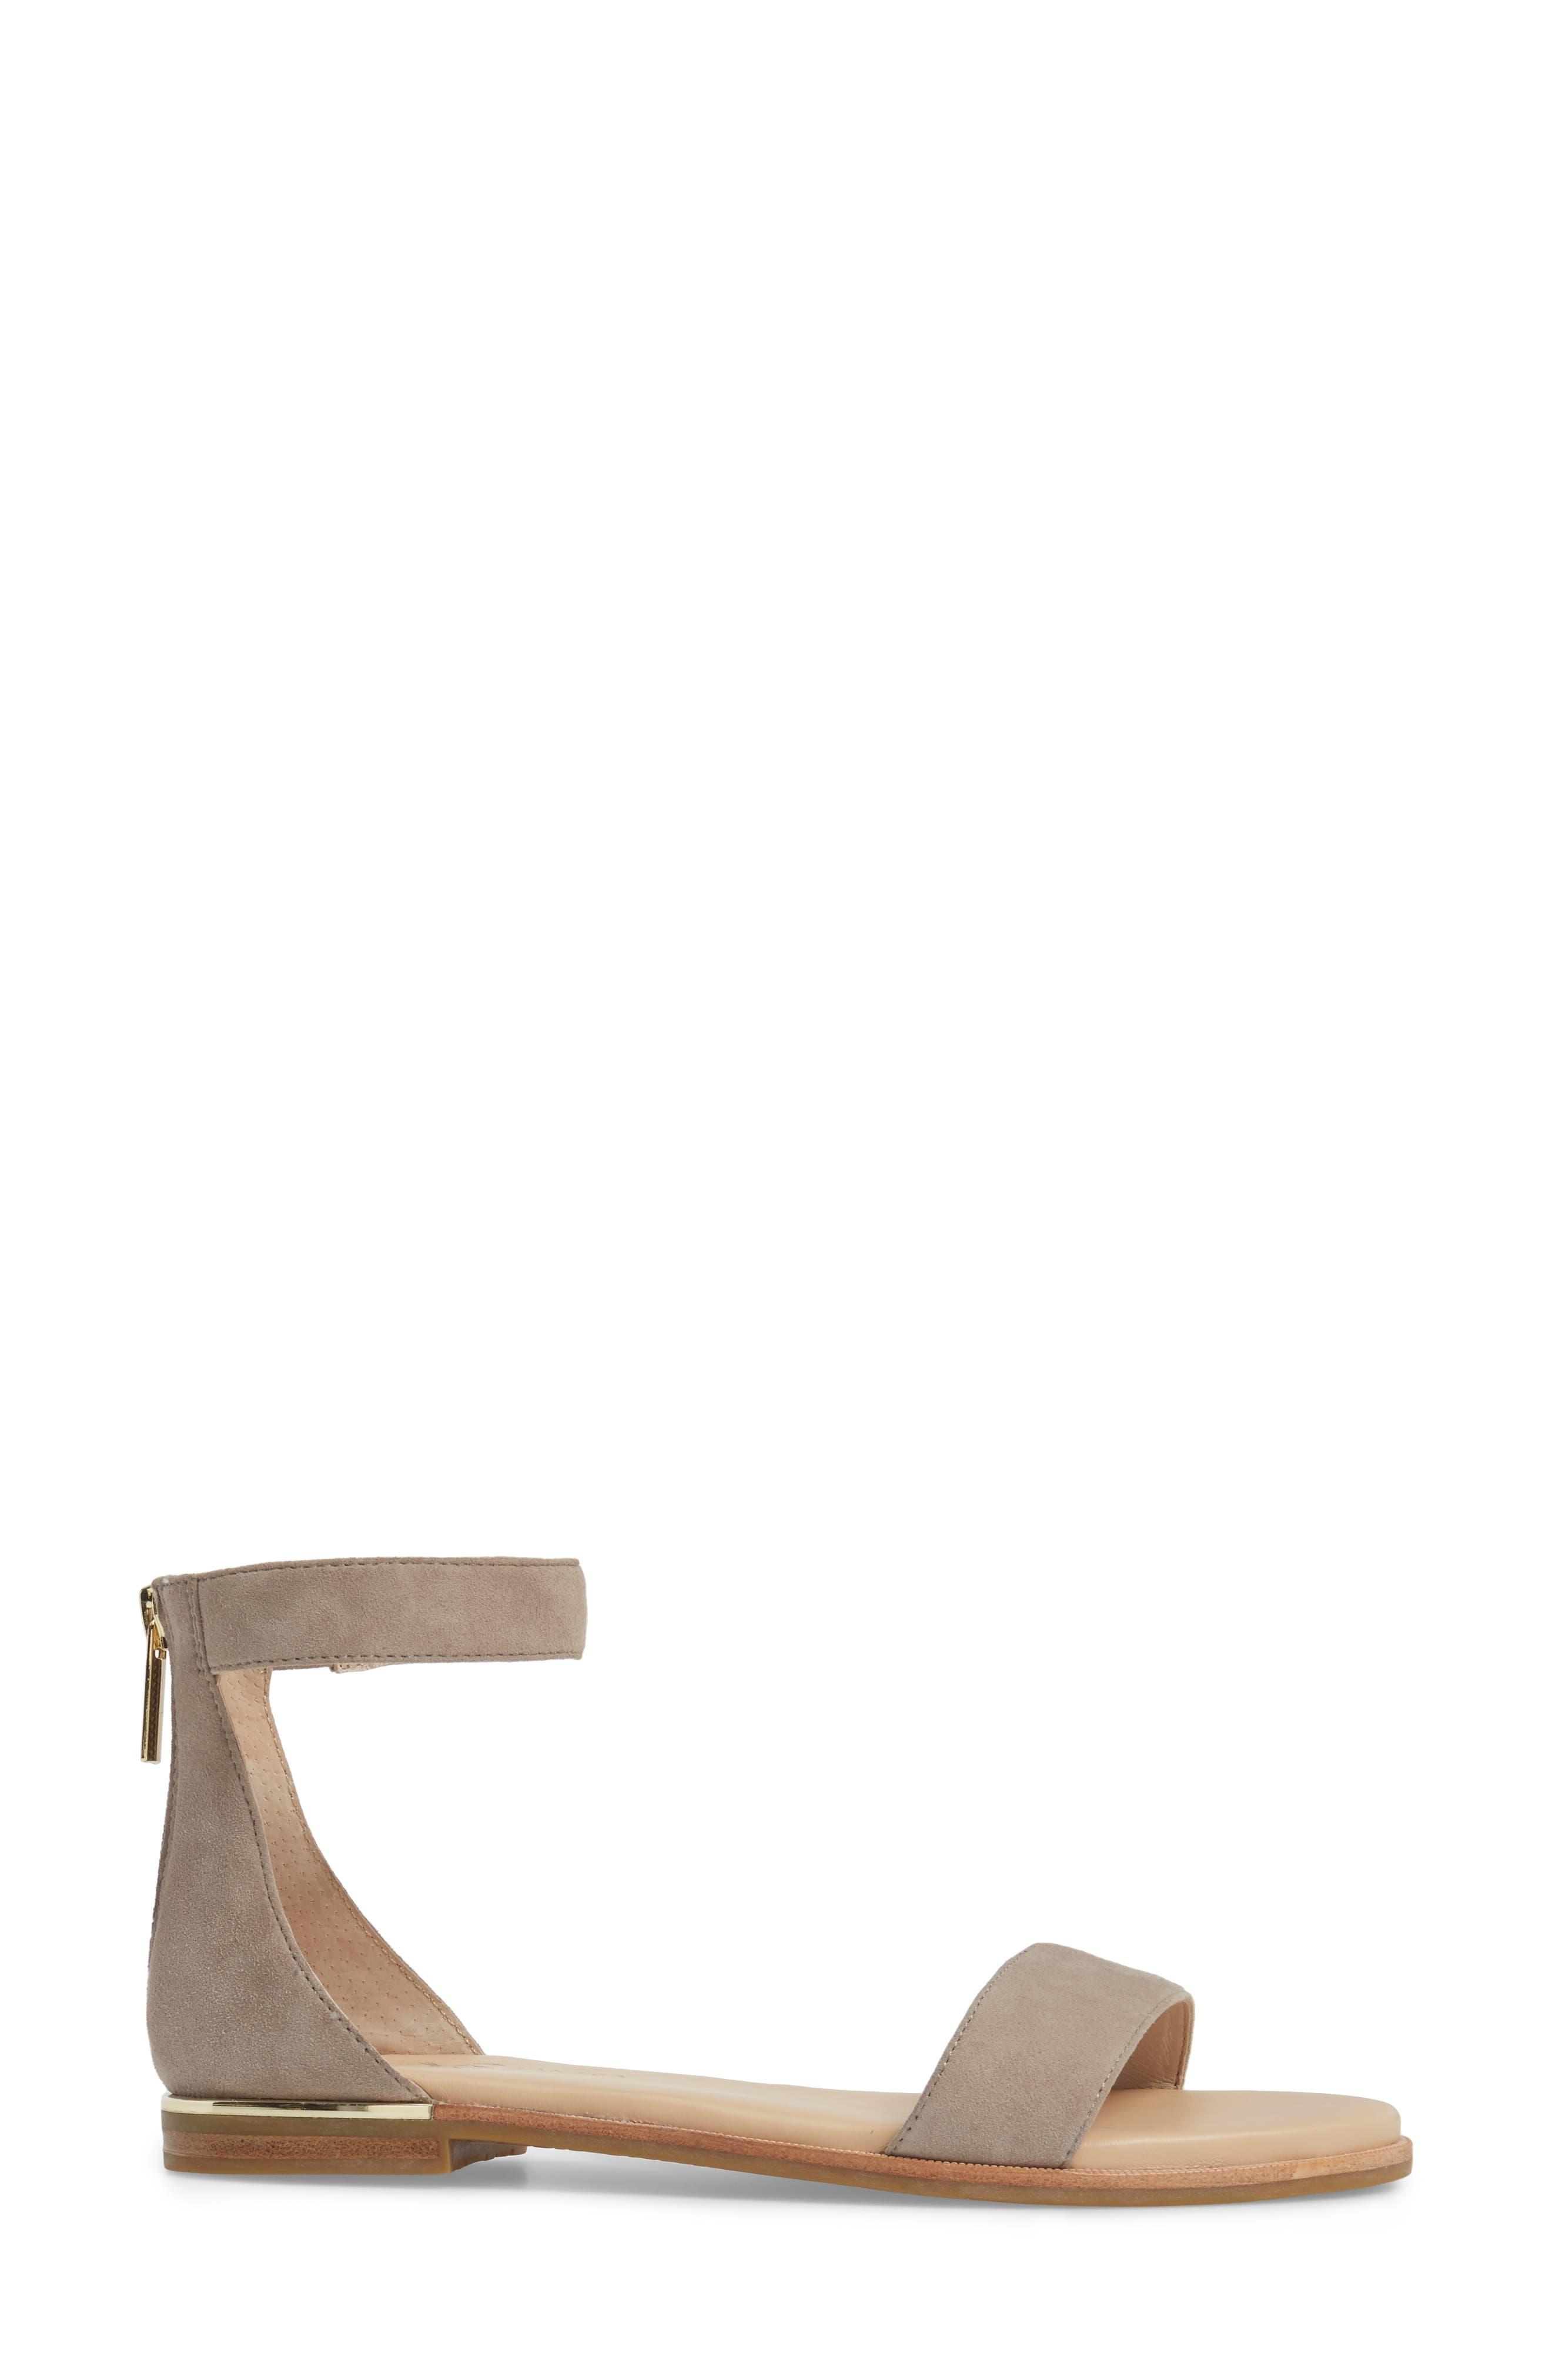 ,                             'Cambelle' Ankle Strap Sandal,                             Alternate thumbnail 35, color,                             250